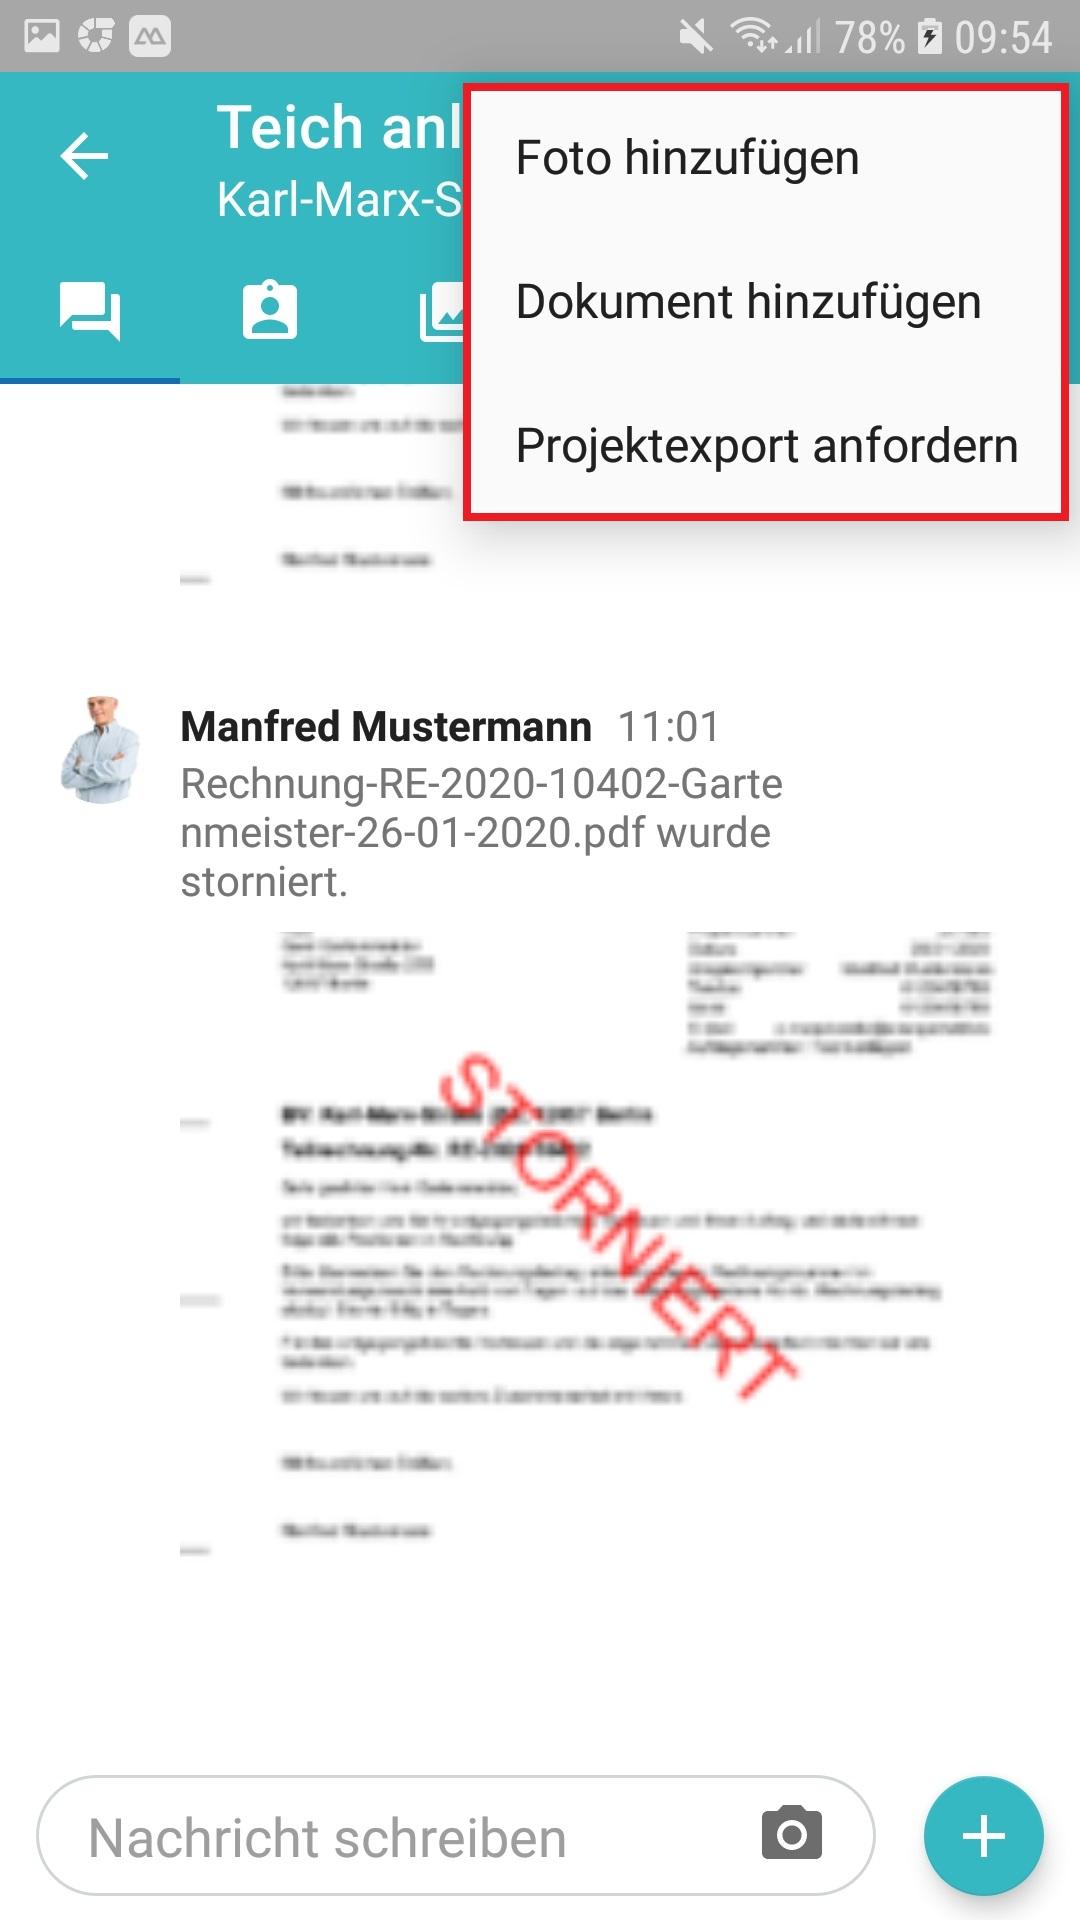 Fotos_Dokumente_Projektexport_anfordern_Rechteck_drum.jpg